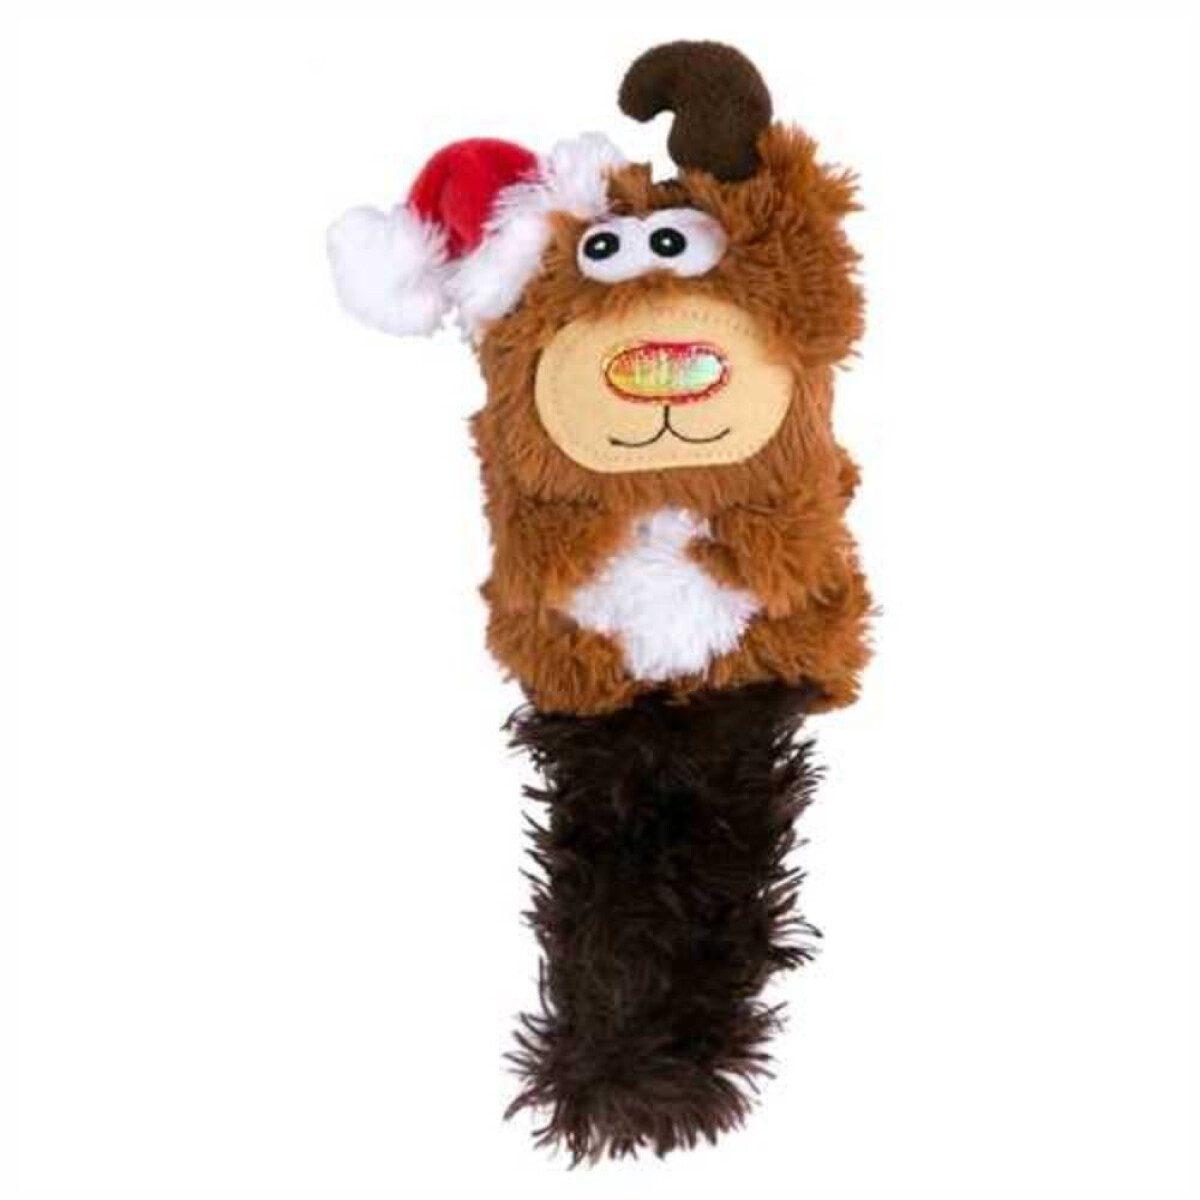 Kong božićni Kickeroo Sob, igračka za mačke